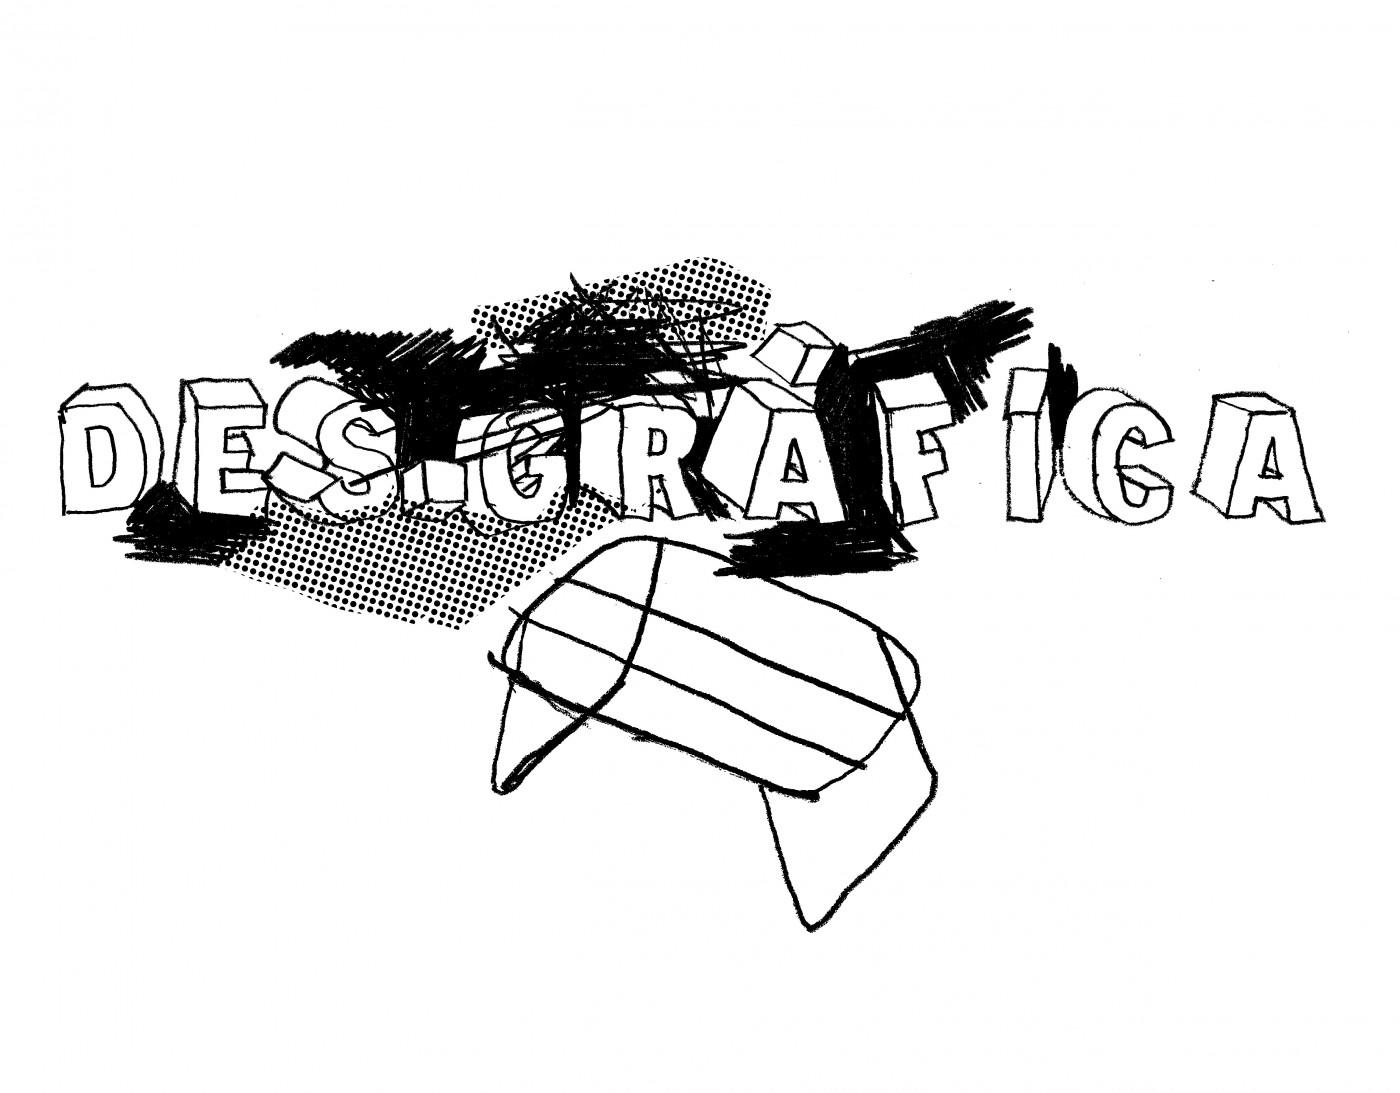 desgrafica-logo-300-1400x1093